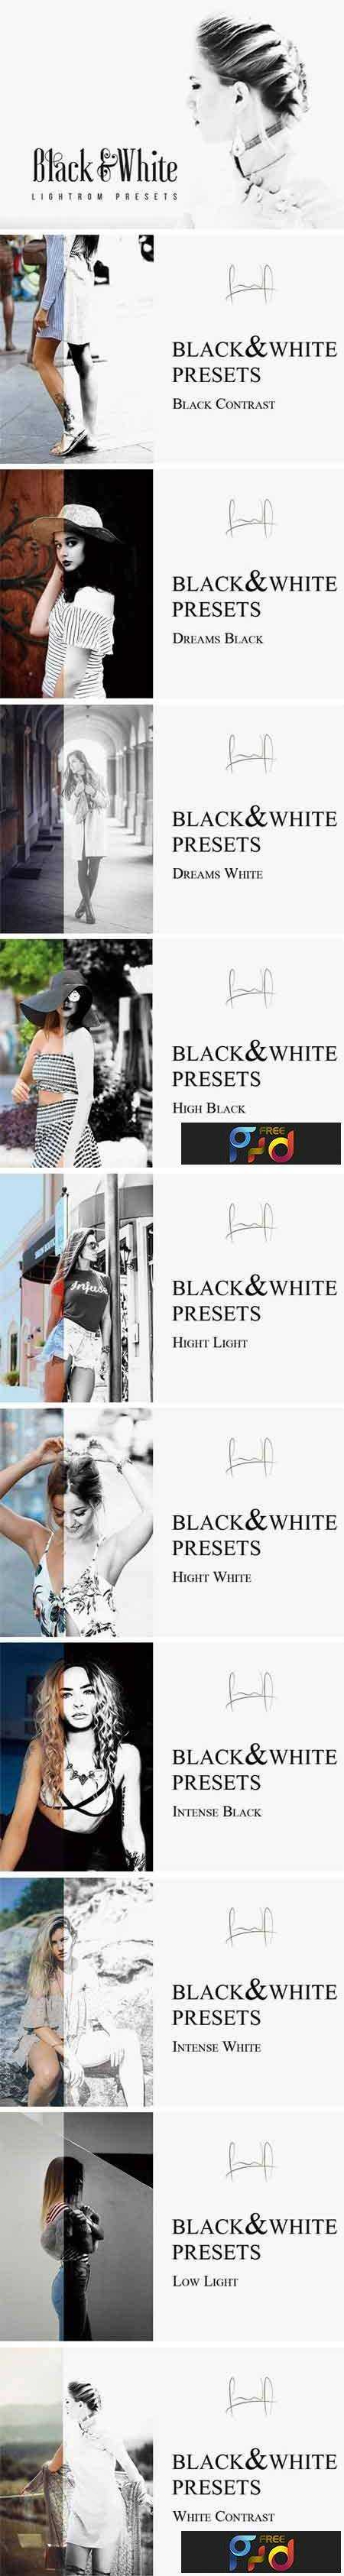 1706210 Black & White Lightroom Presets 1884026 1